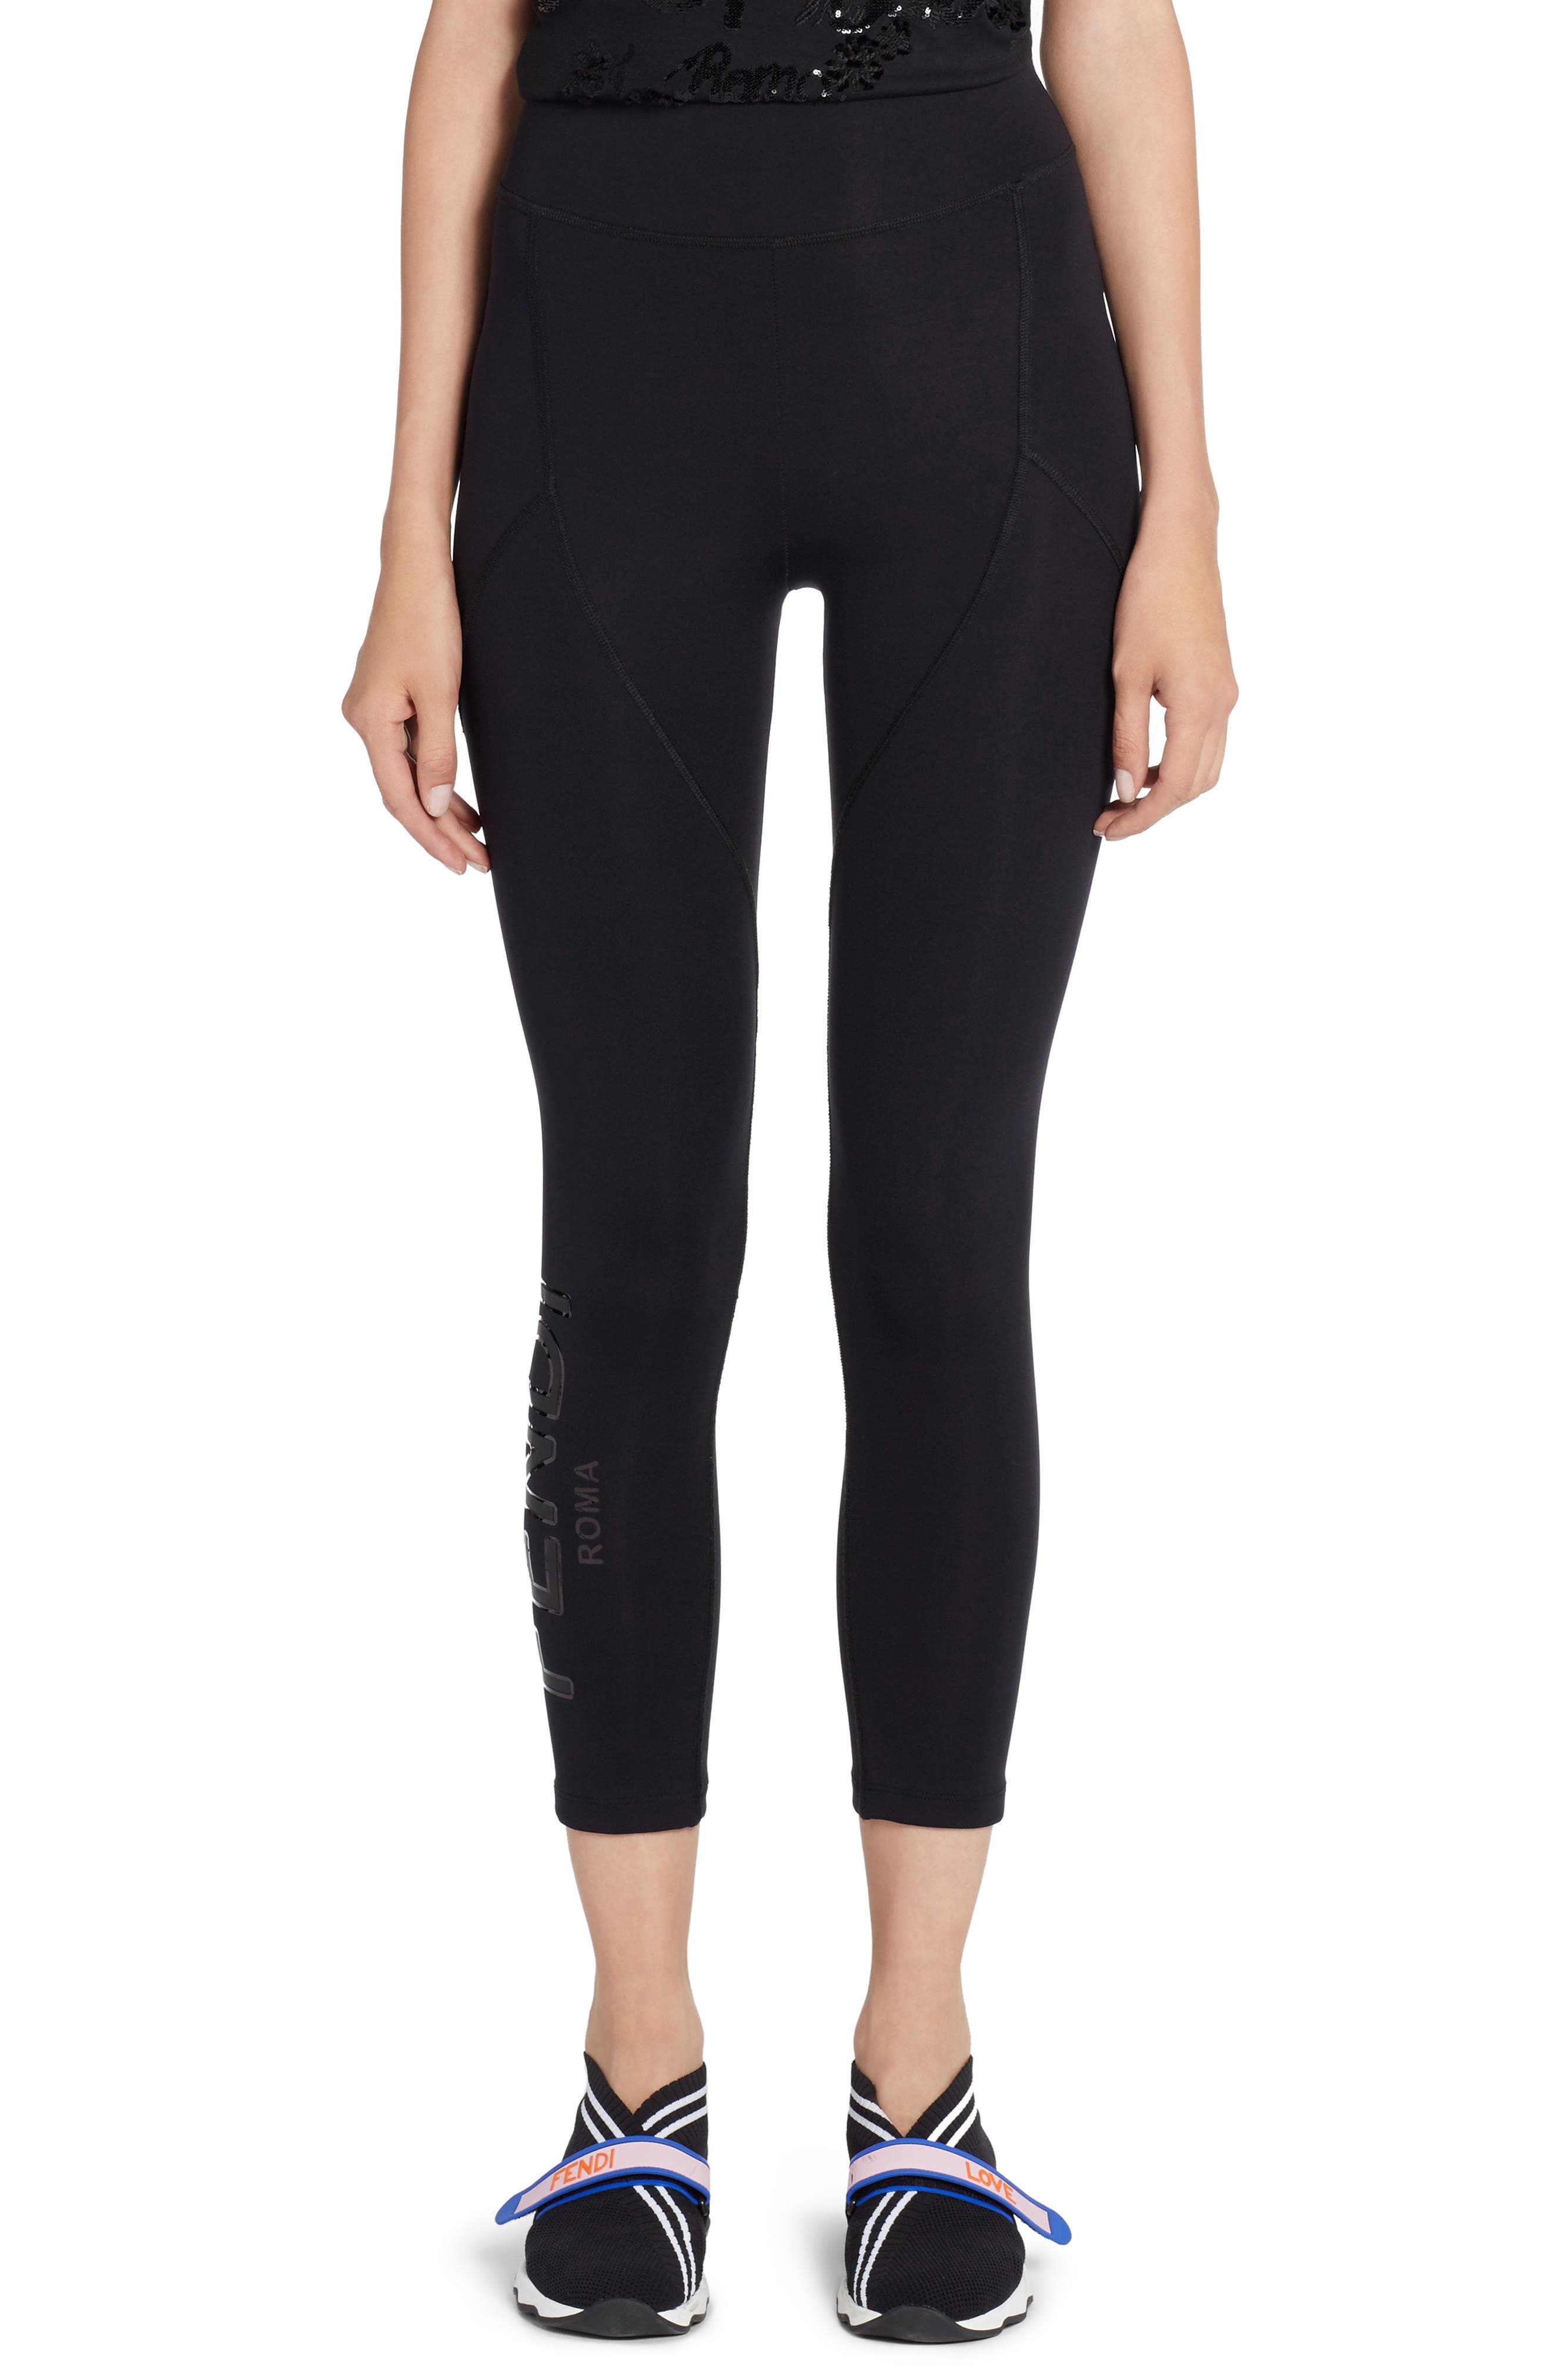 Roma Yoga Pants,                         Main,                         color,